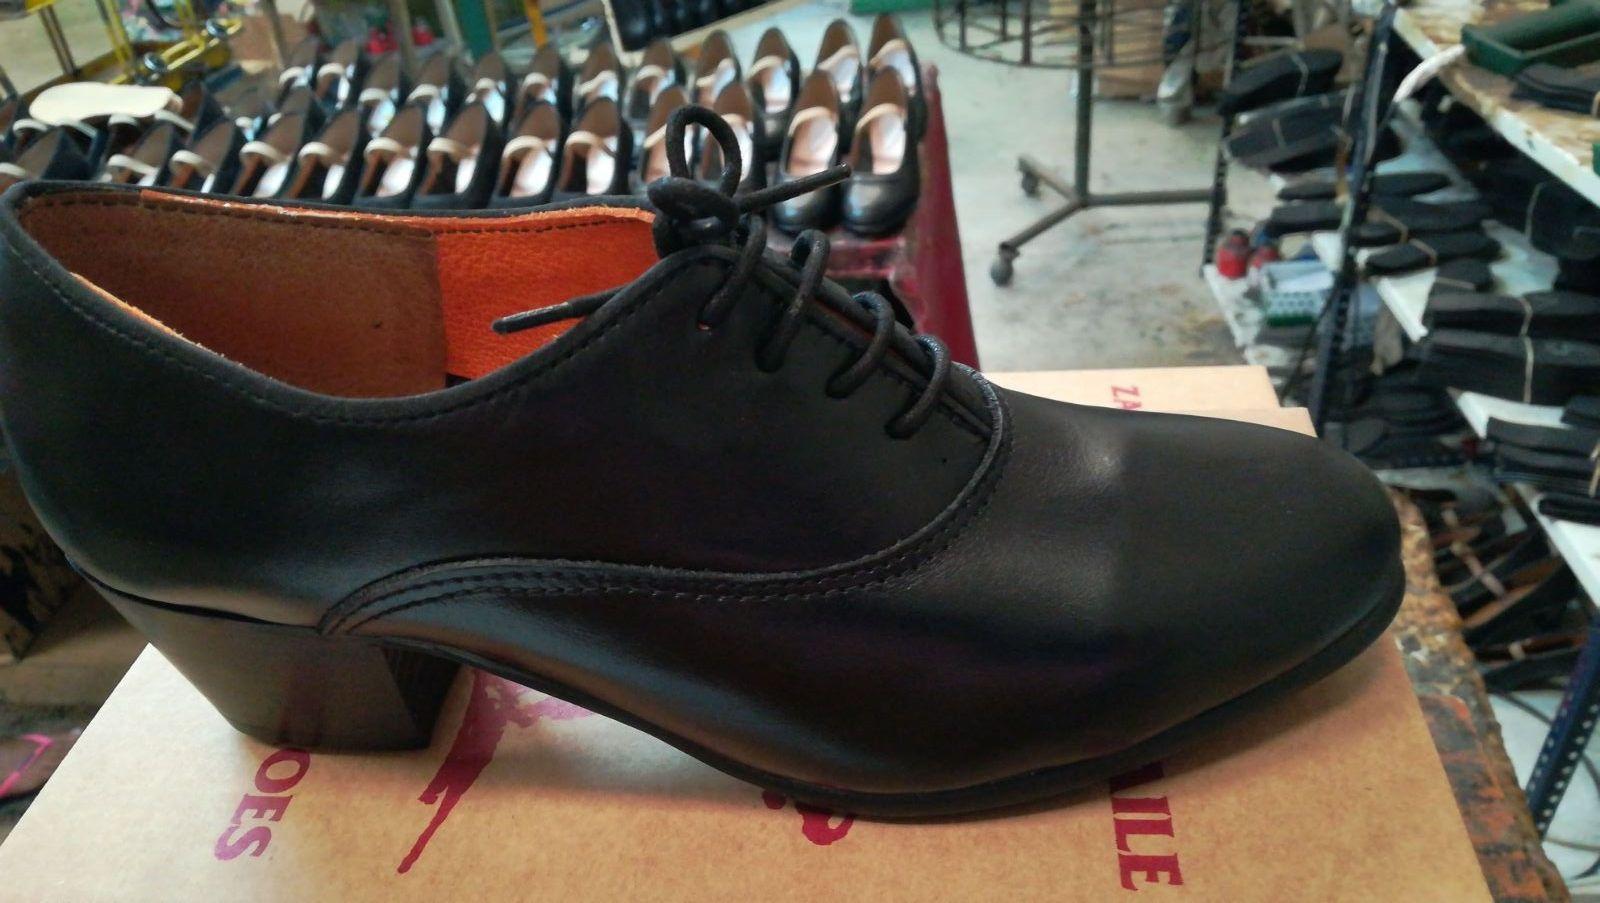 Zapato piel caballero: Productos de Calzados Malaca